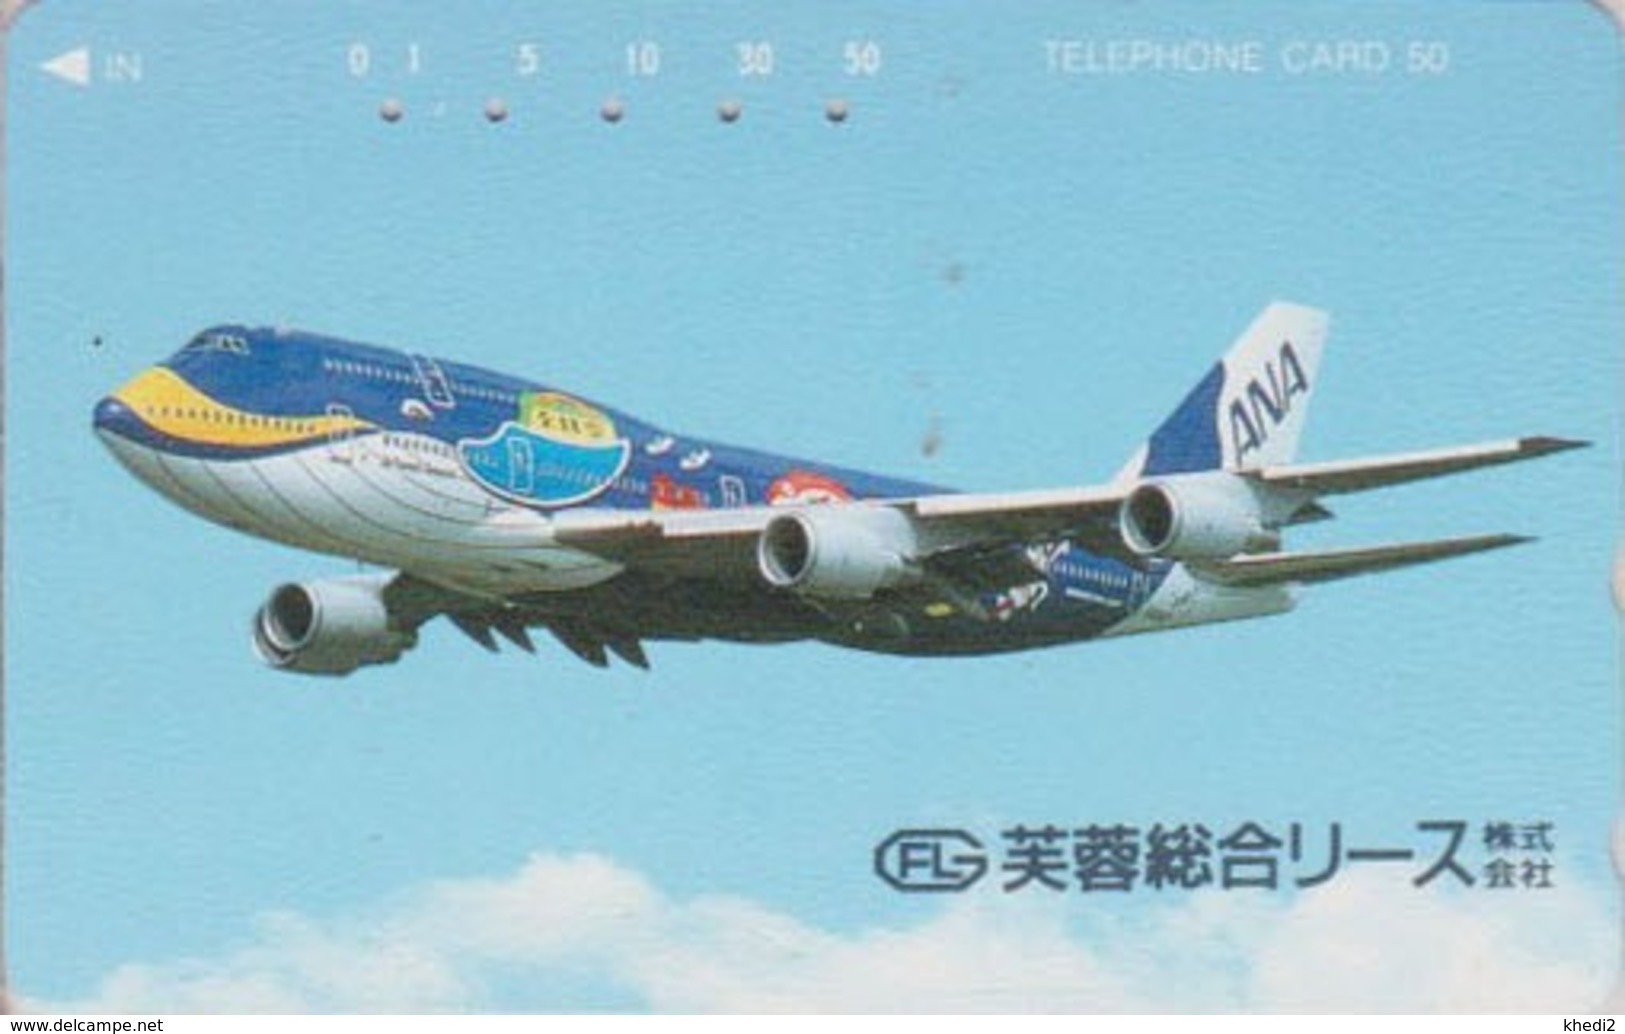 Télécarte Japon / 110-011 - AVION - ANA  ** MARINE JUMBO ** - PLANE Japan Phonecard - Aviation 2302 - Flugzeuge